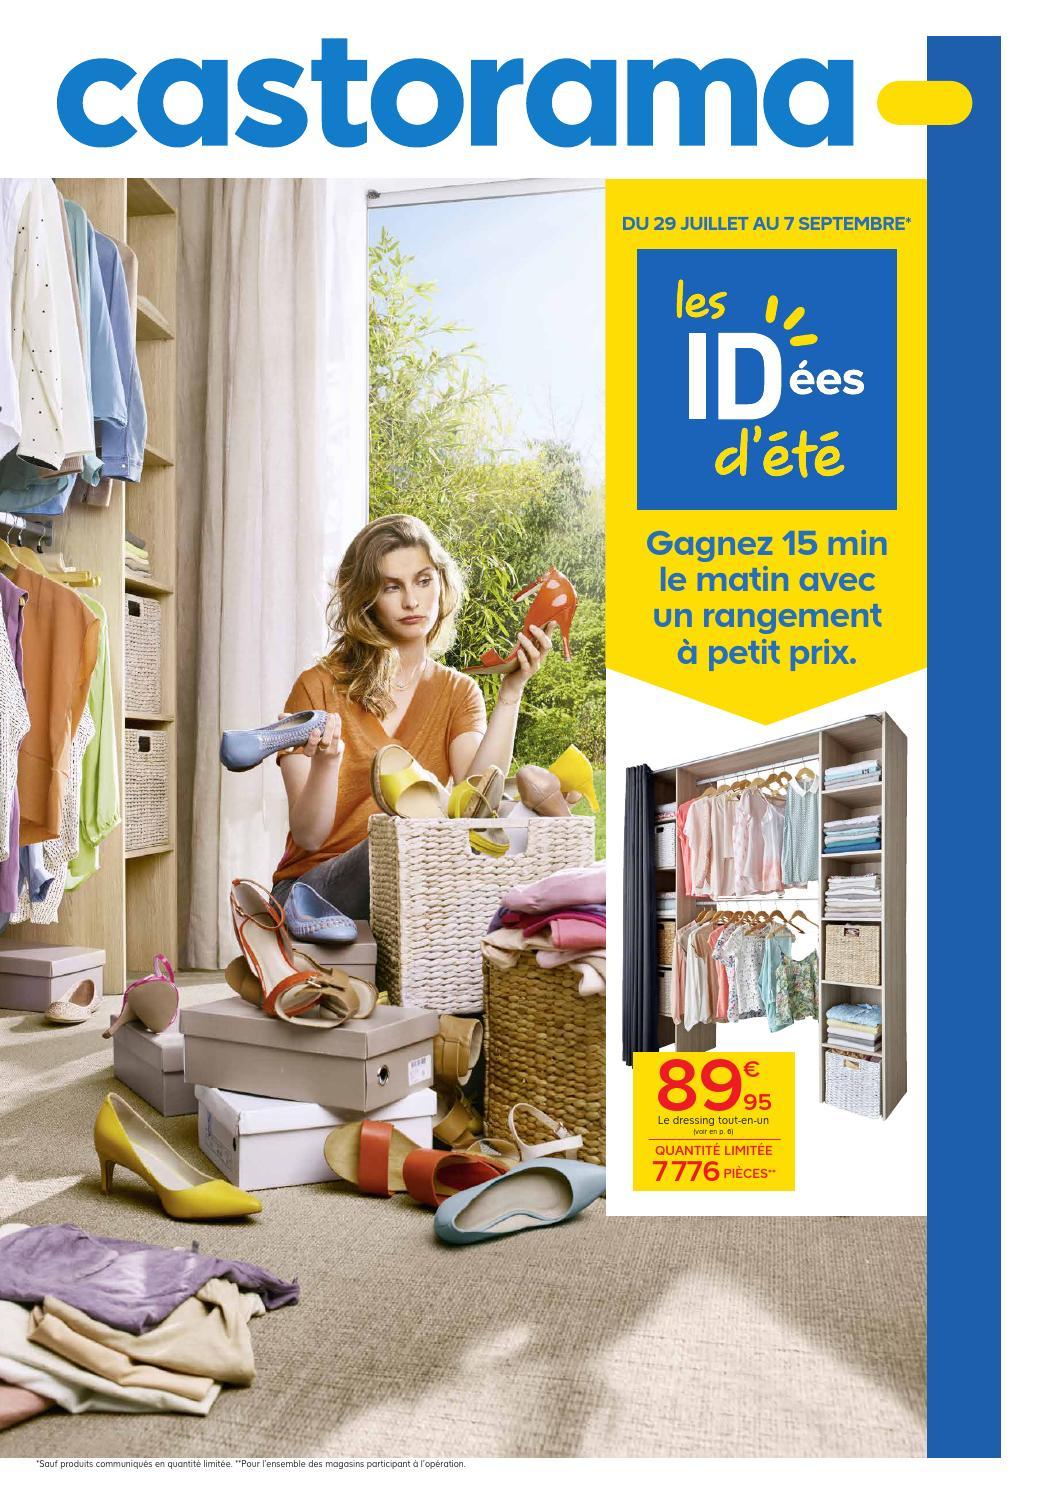 Castorama Catalogue 29Juillet 7Septembre2015 By ... pour Epdm Castorama